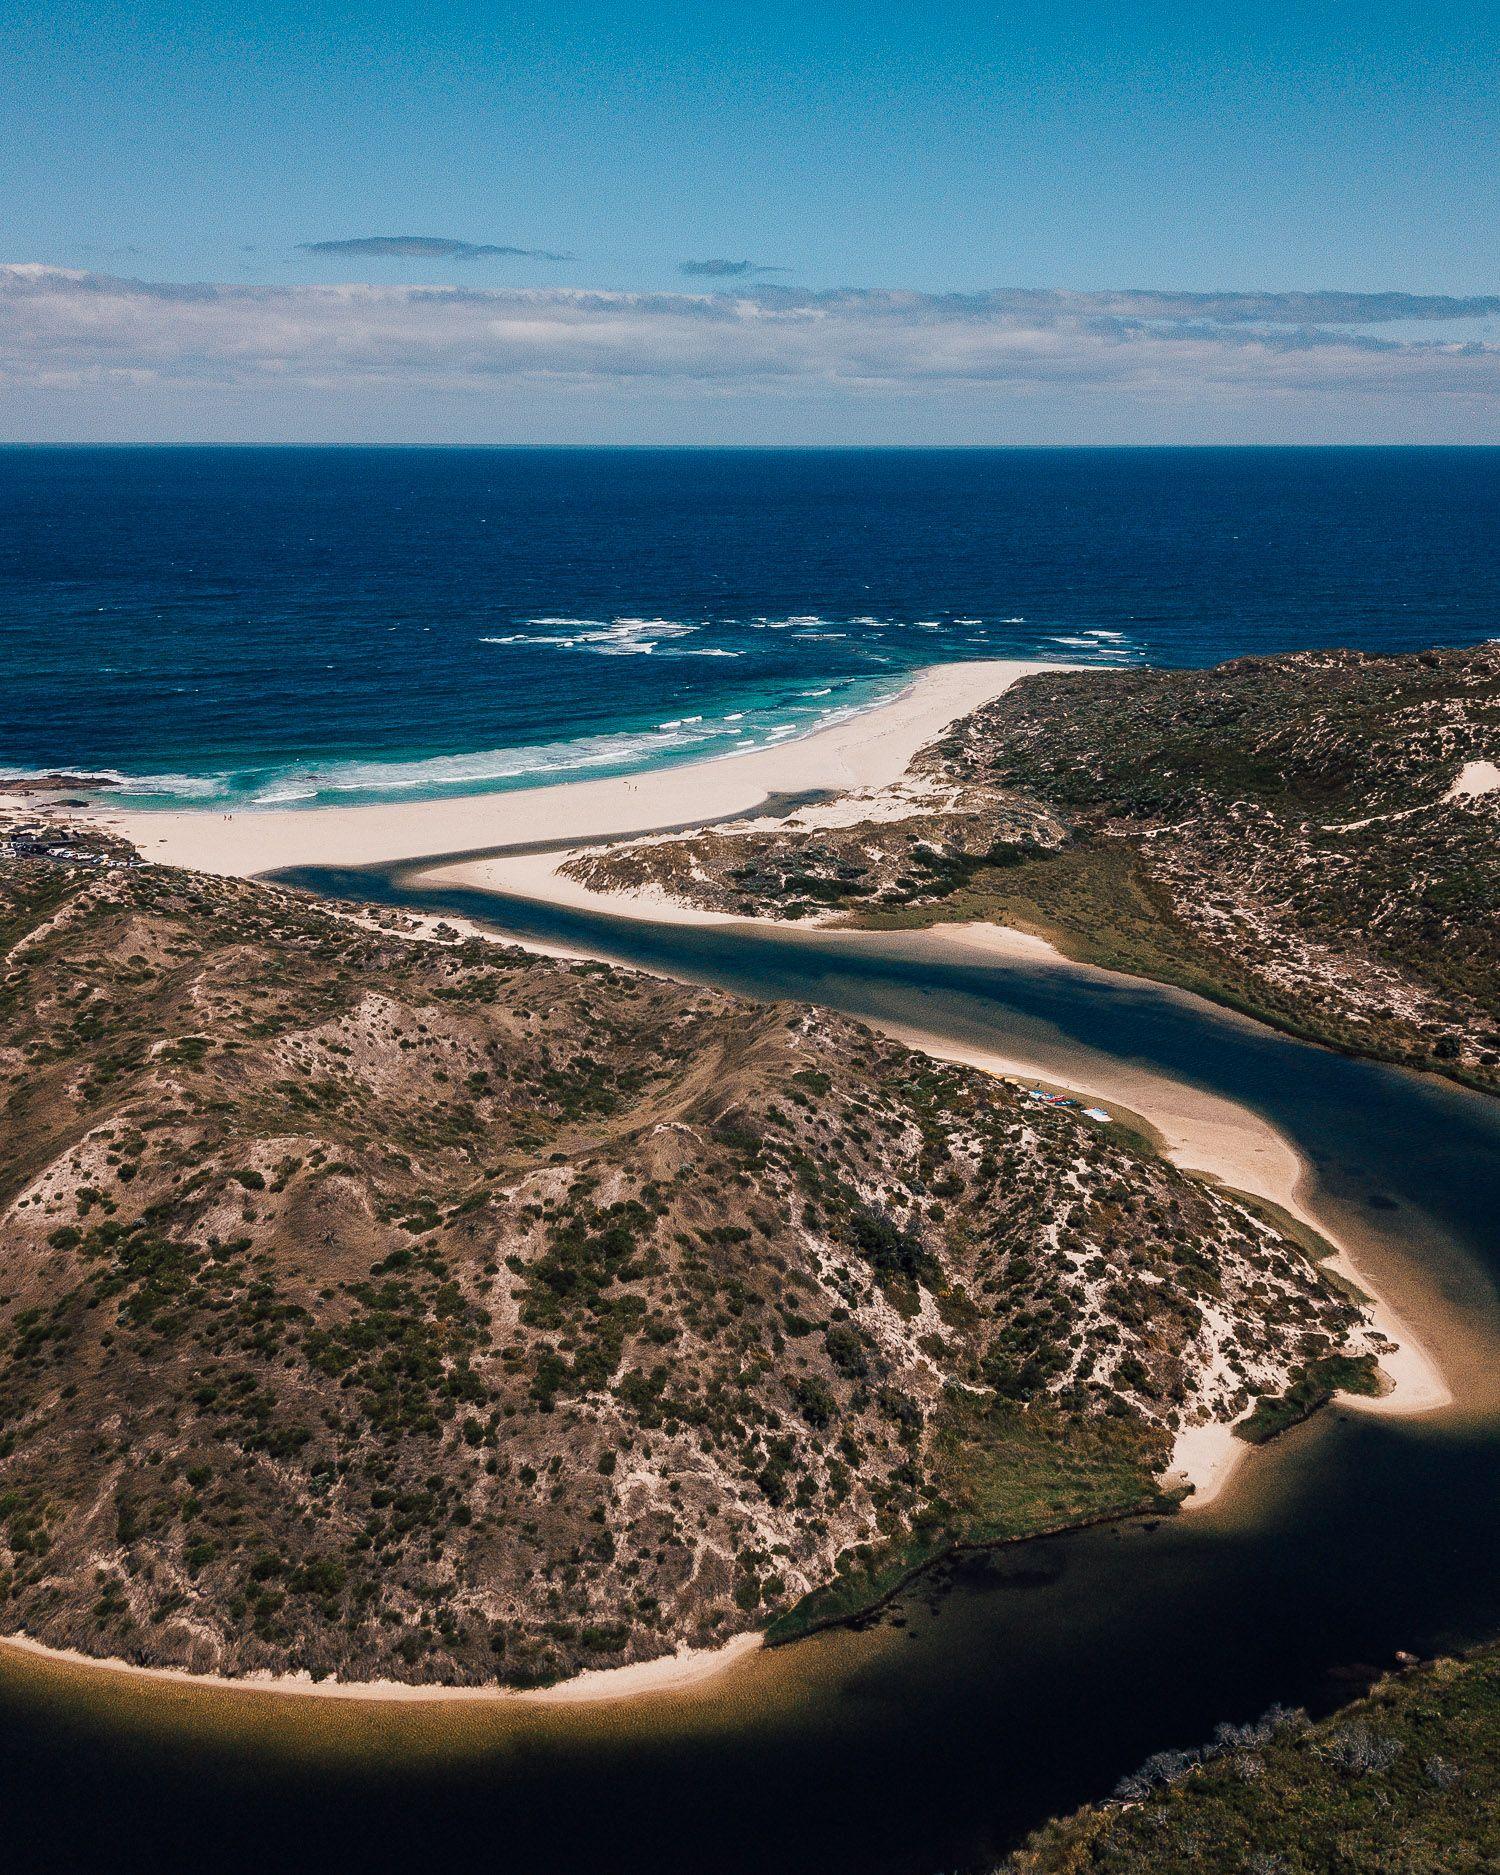 Tipps Fur Einen Western Australia Roadtrip Von Perth Nach Esperance South Pacific Islands Beautiful Places Western Australia